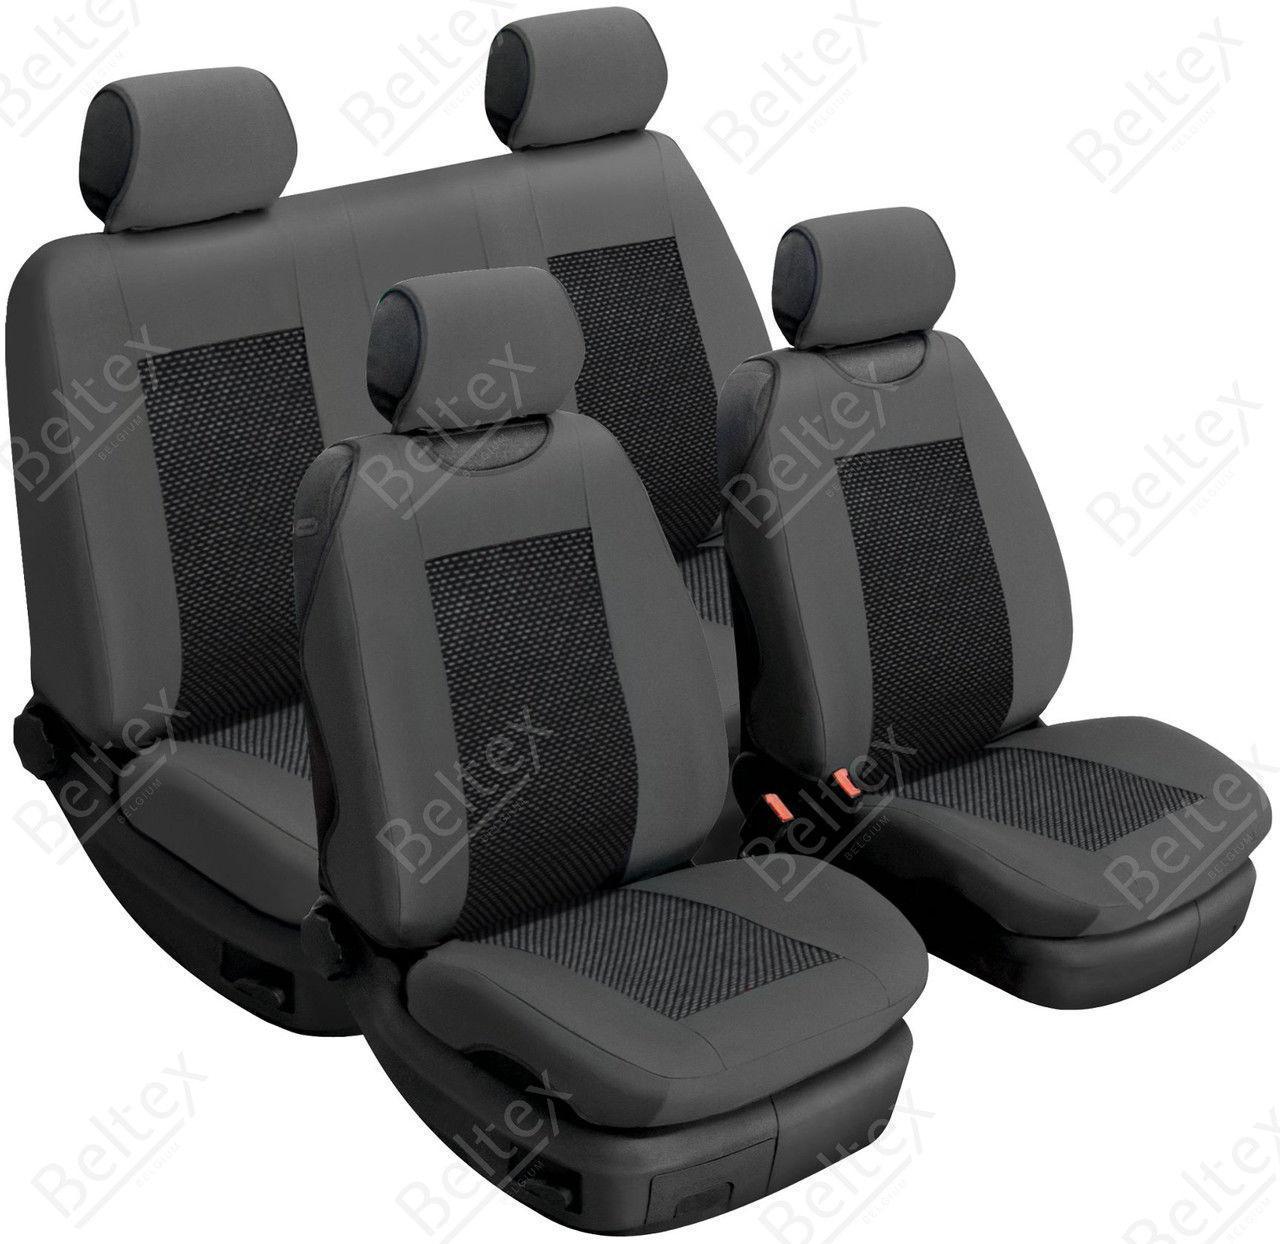 Майки/чехлы на сиденья Ниссан Тиида (Nissan Tiida)